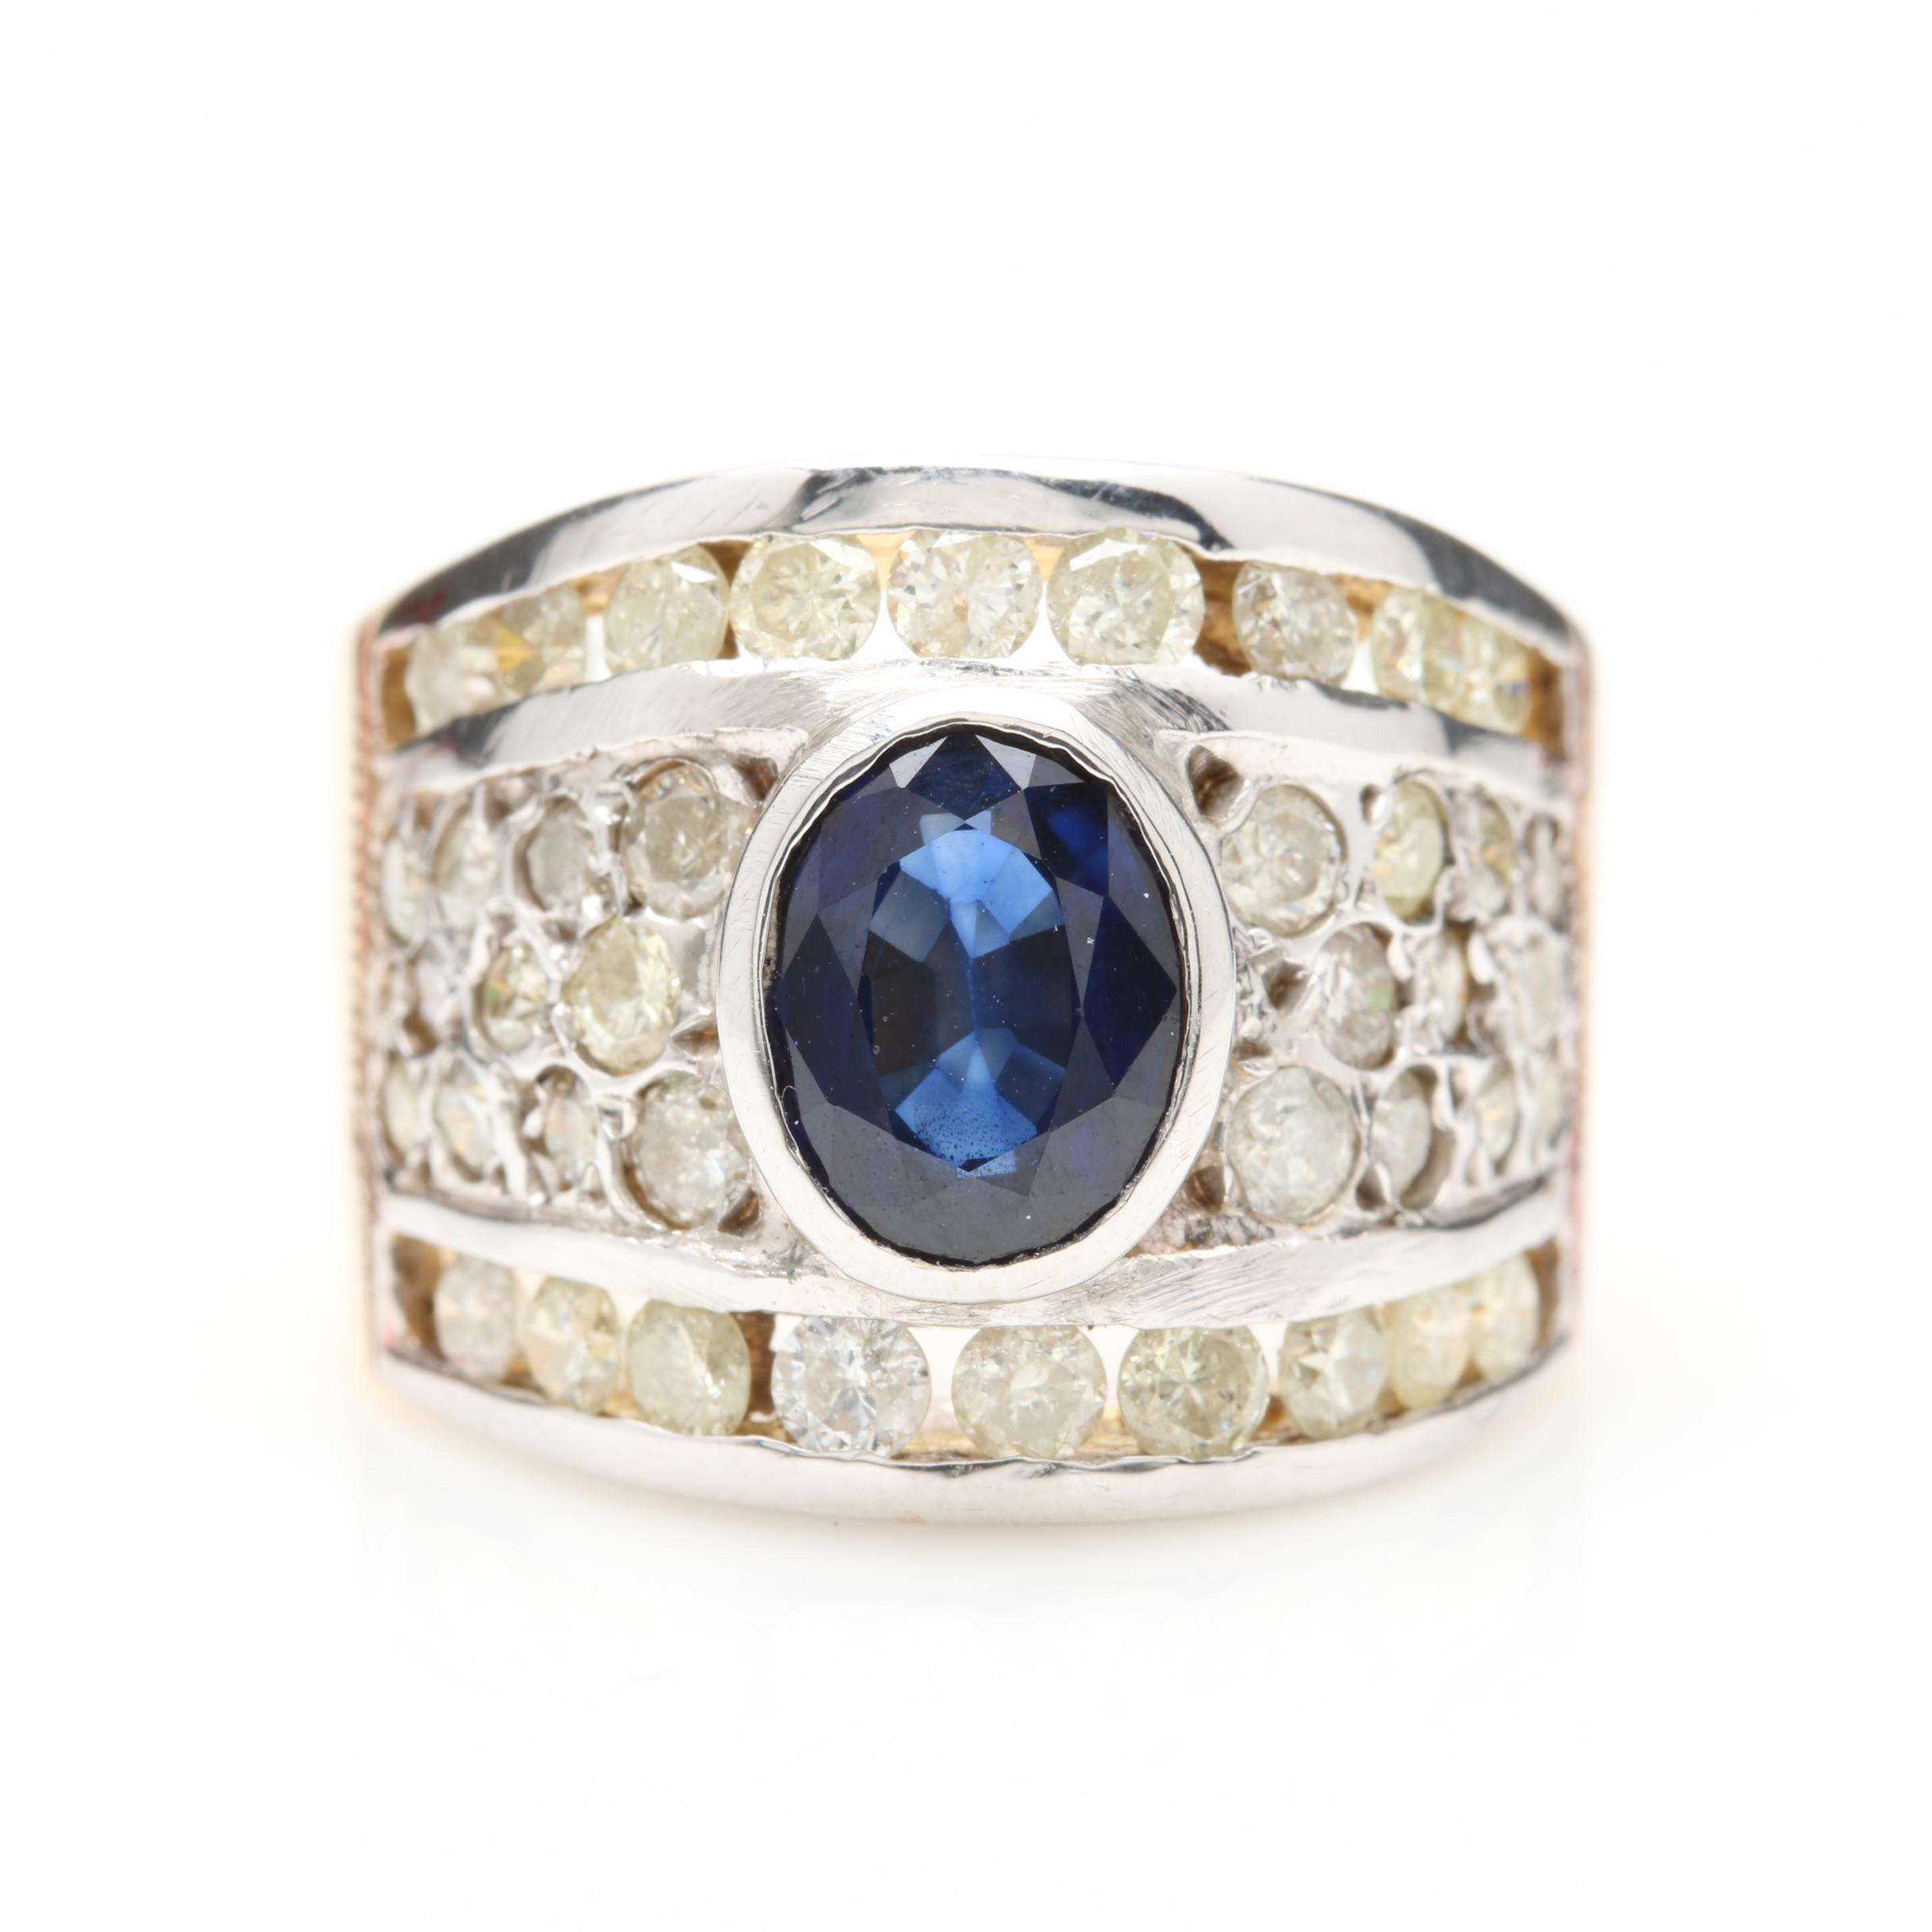 14K Yellow Gold 1.35 CT Sapphire and 1.38 CTW Diamond Ring